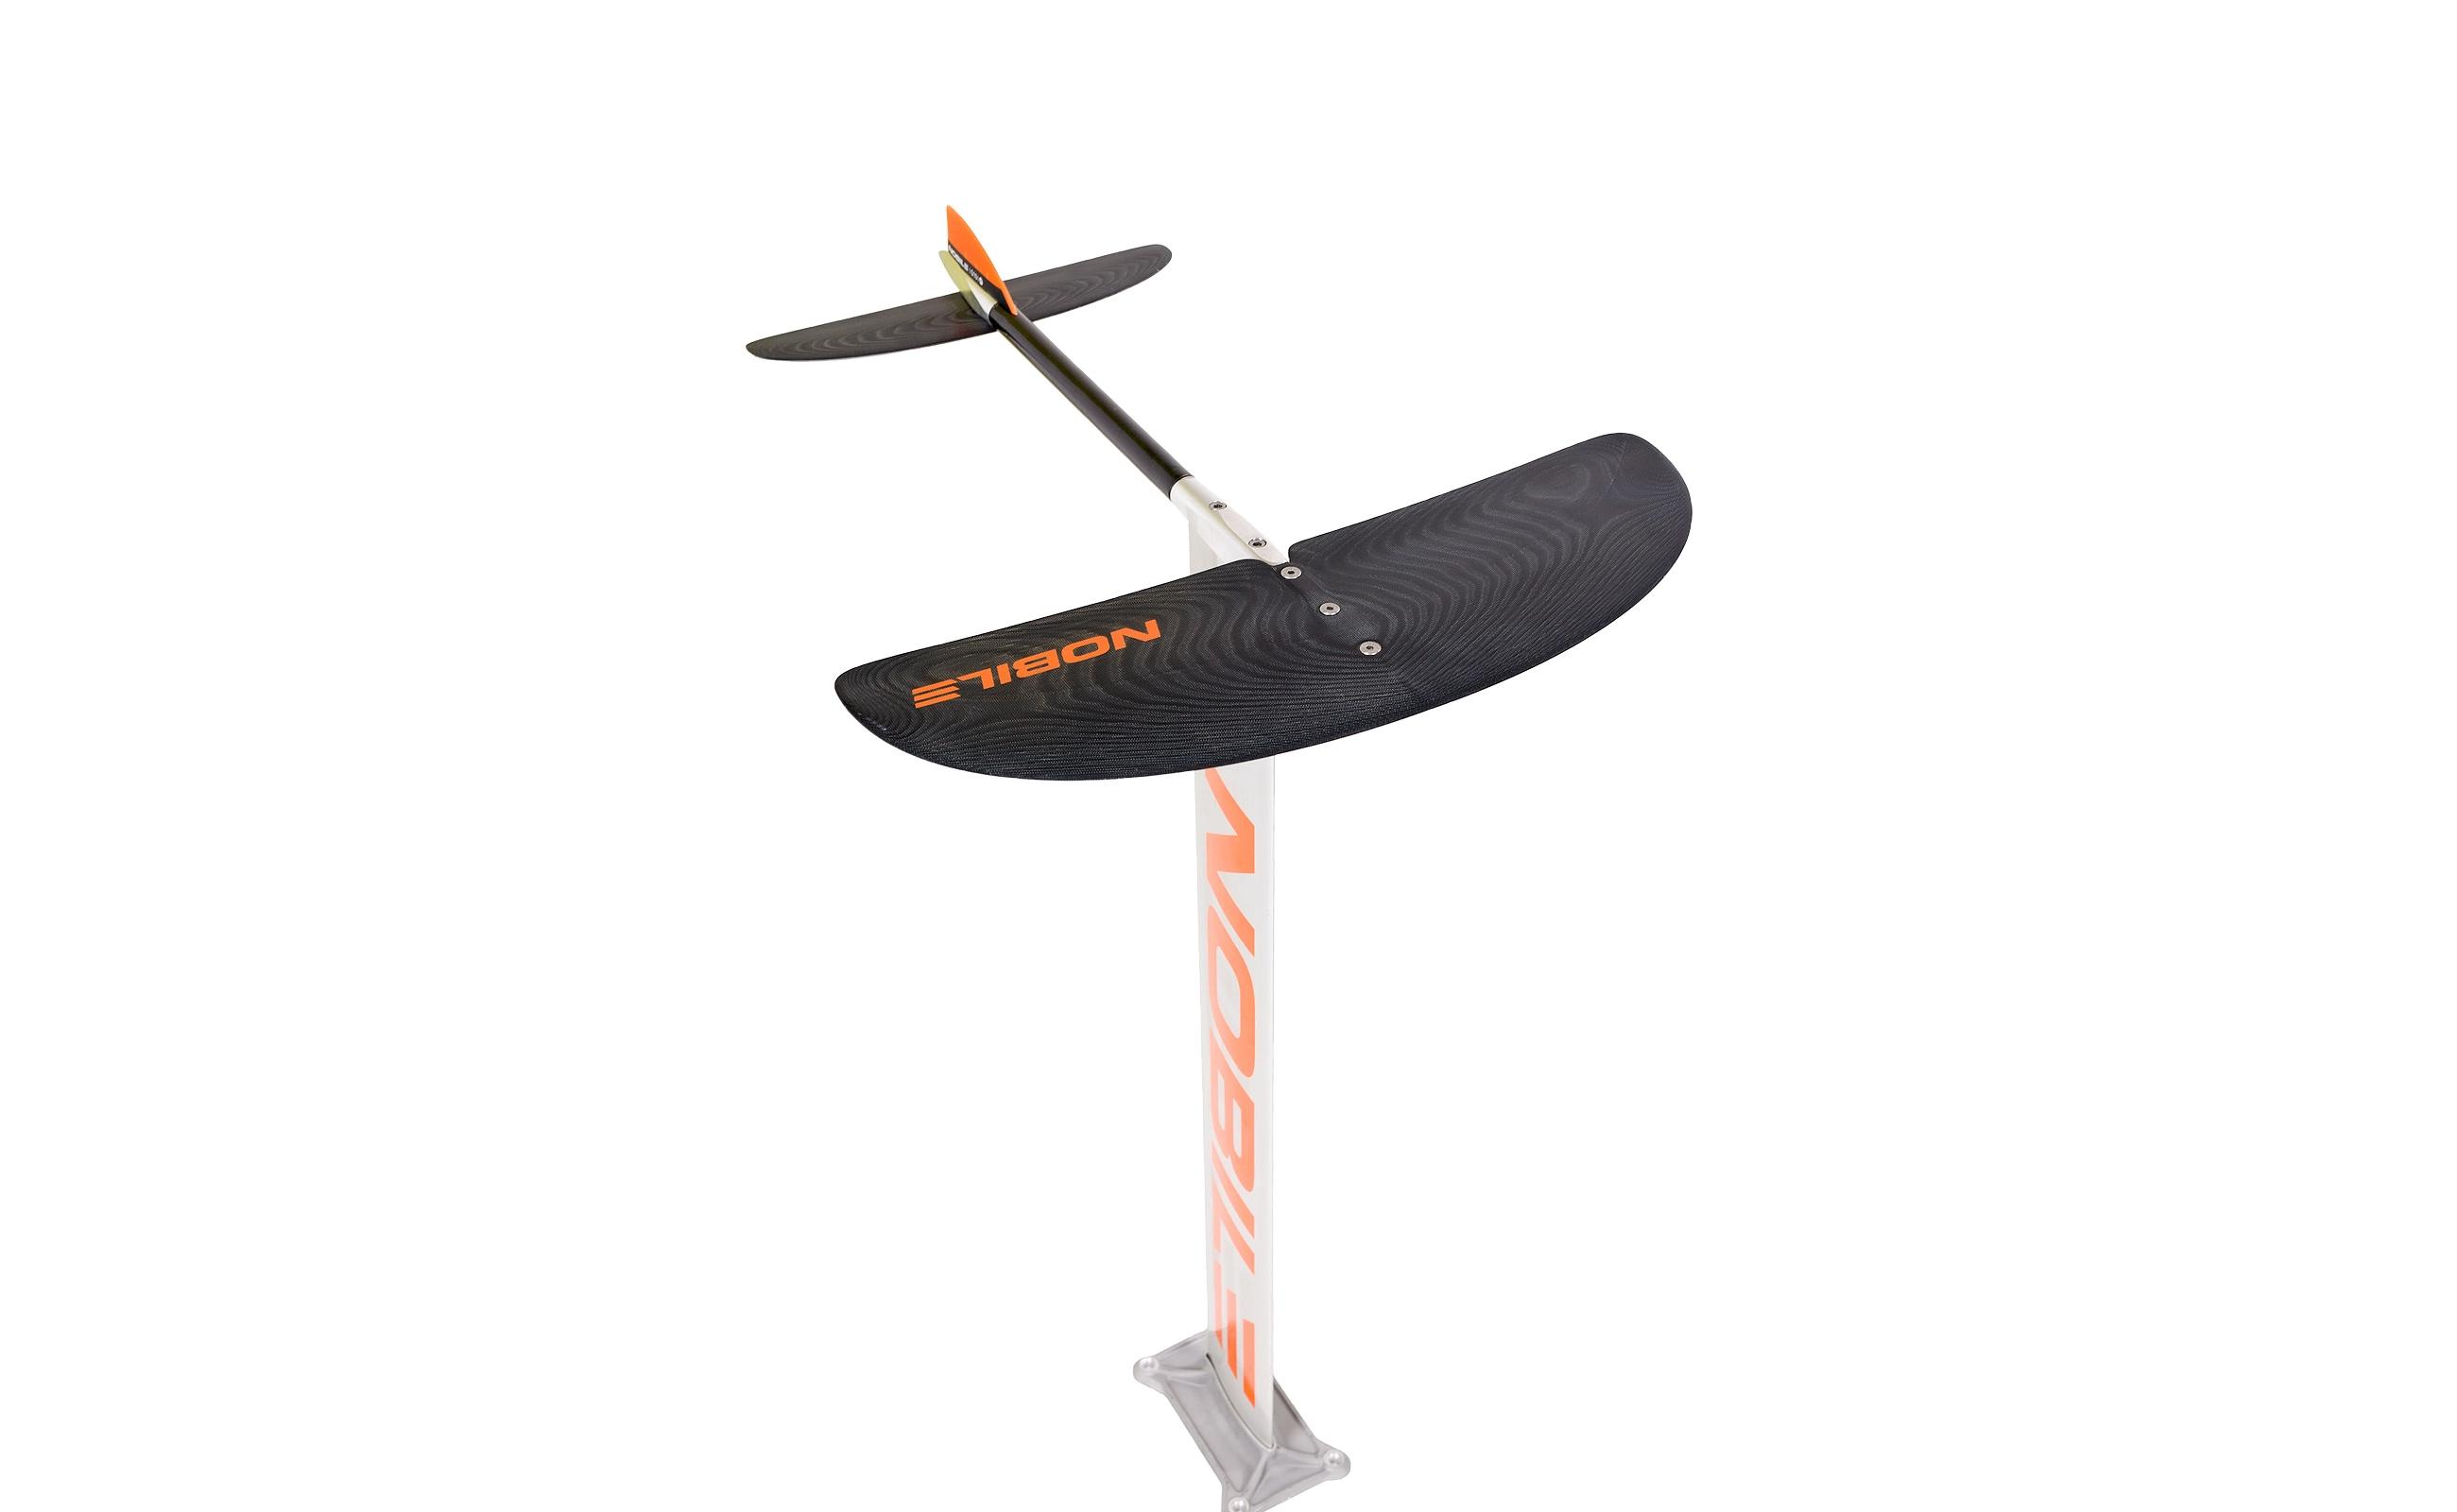 How to mount it ? Nobile ZEN Hydrofoil